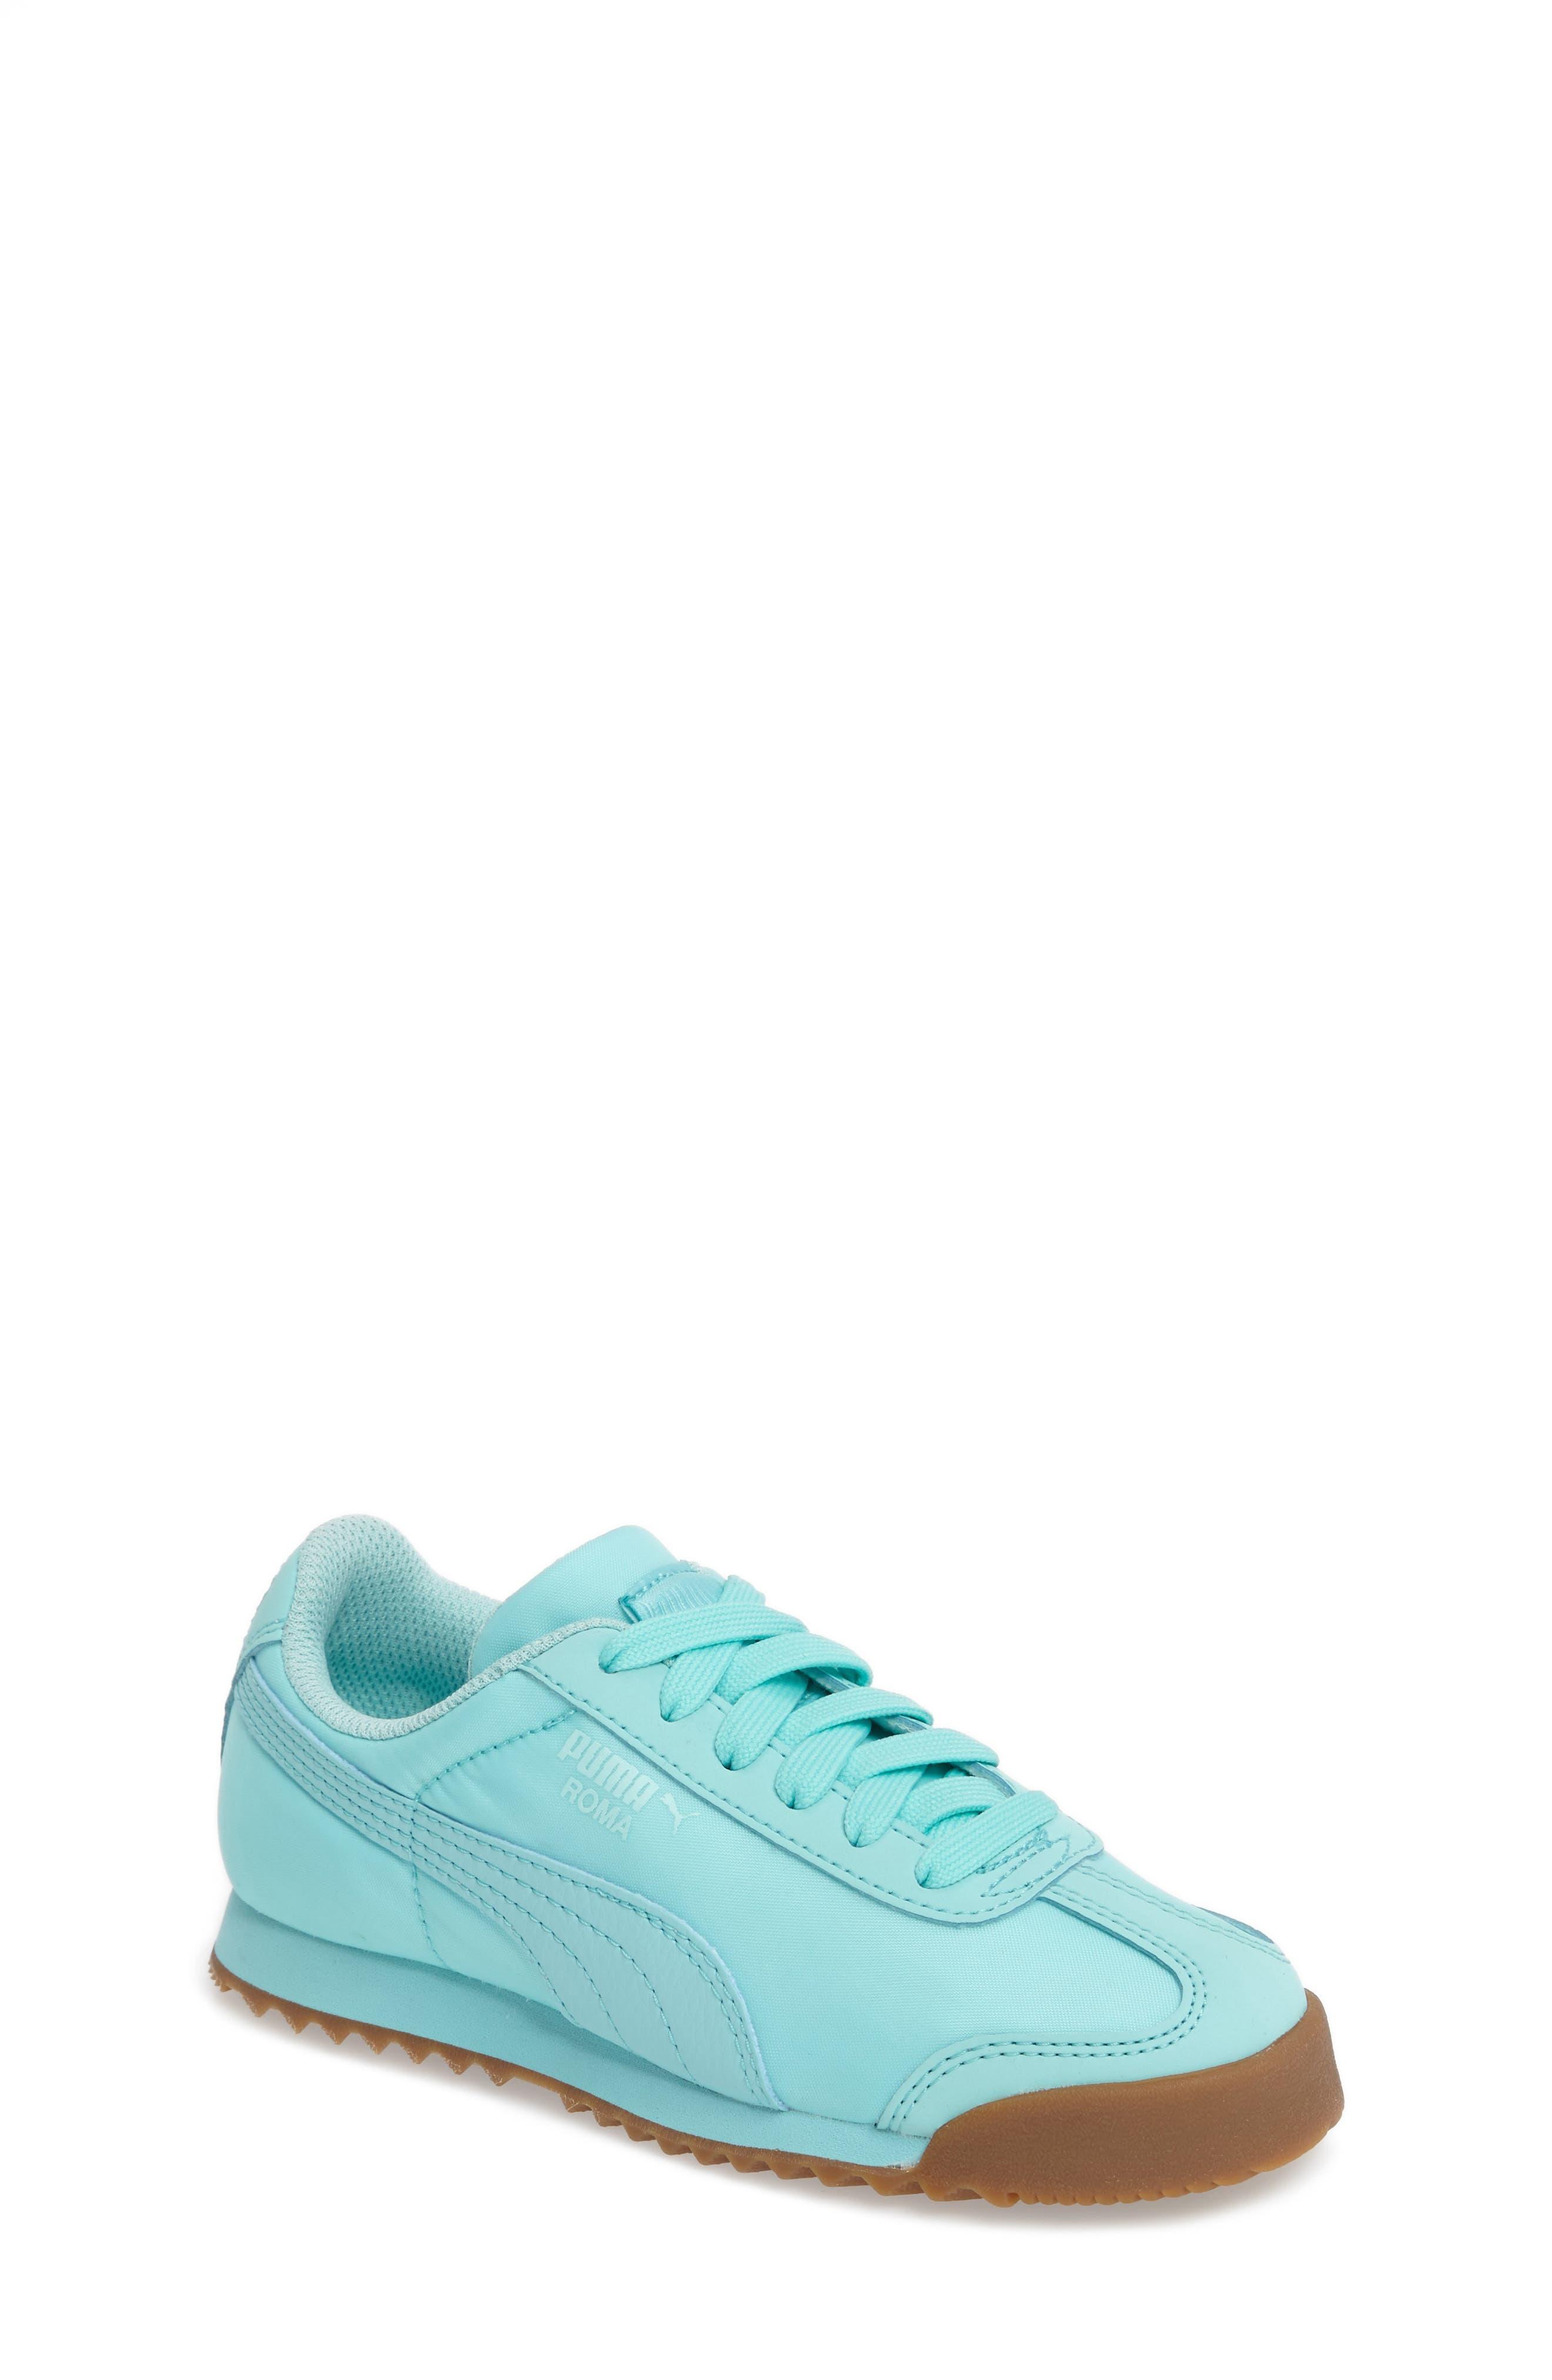 Roma Basic Summer Sneaker,                             Main thumbnail 1, color,                             400